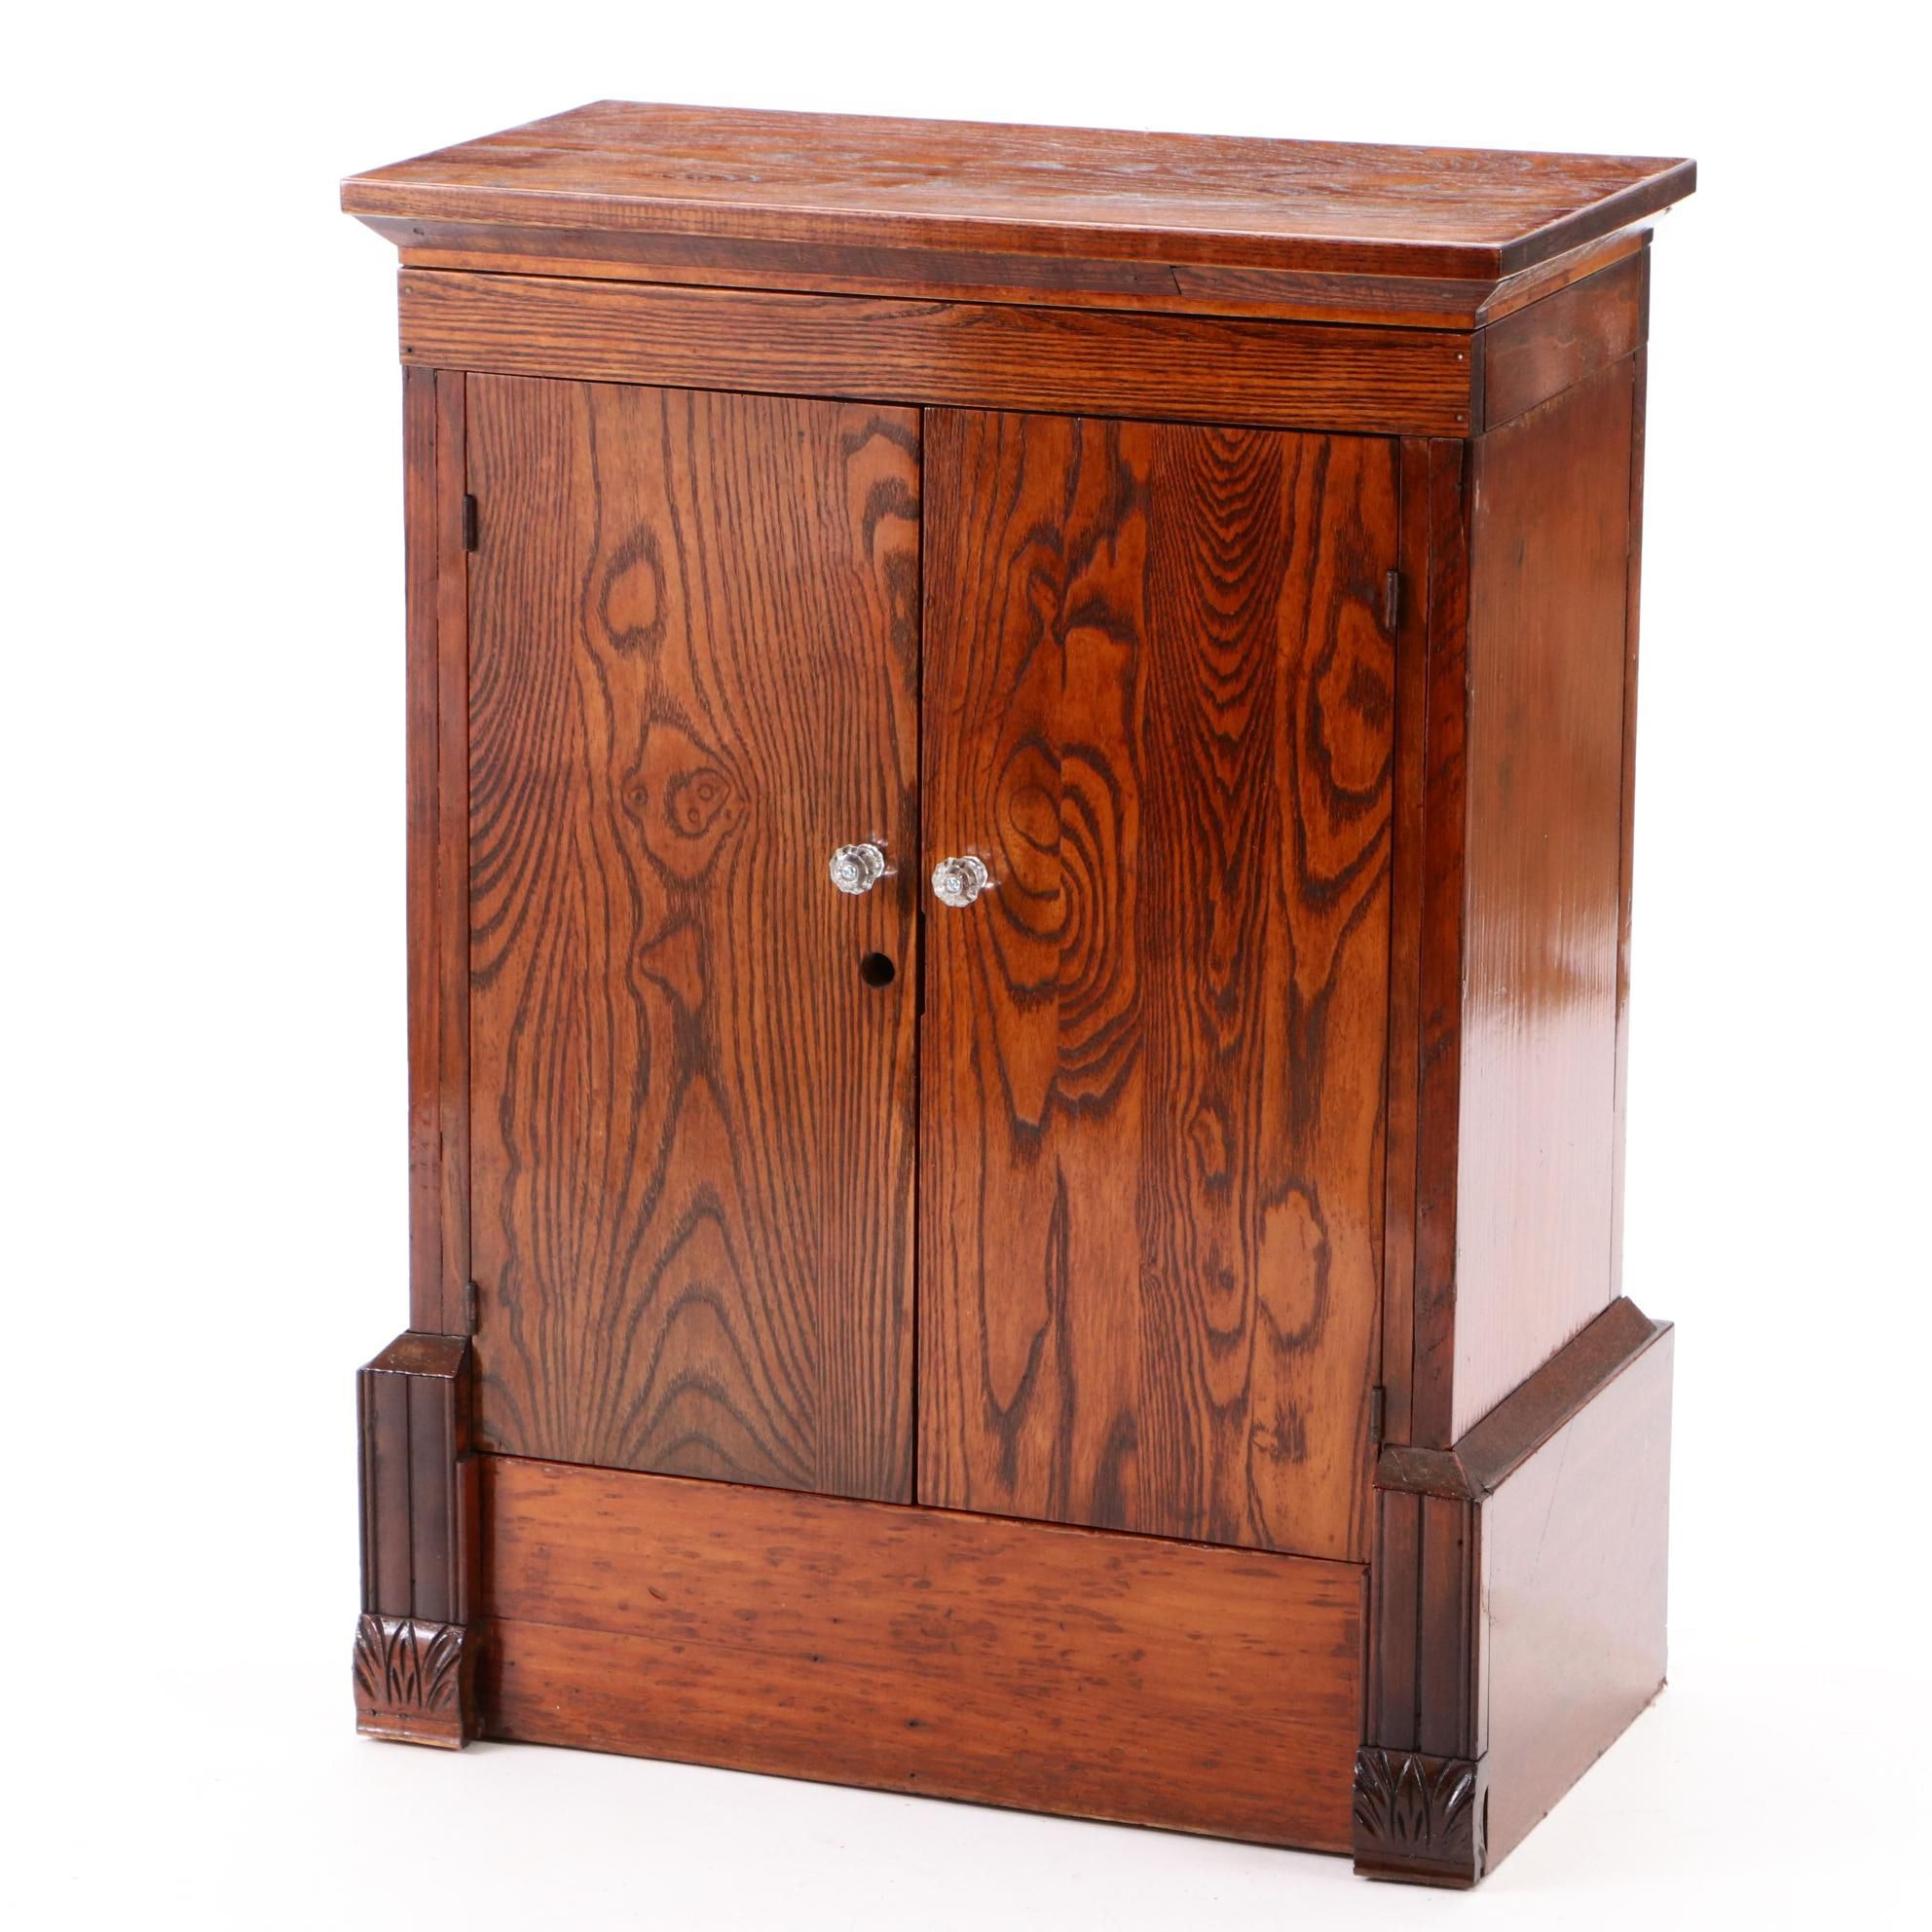 Late Victorian Oak Storage Cabinet, Mid/Late 19th Century